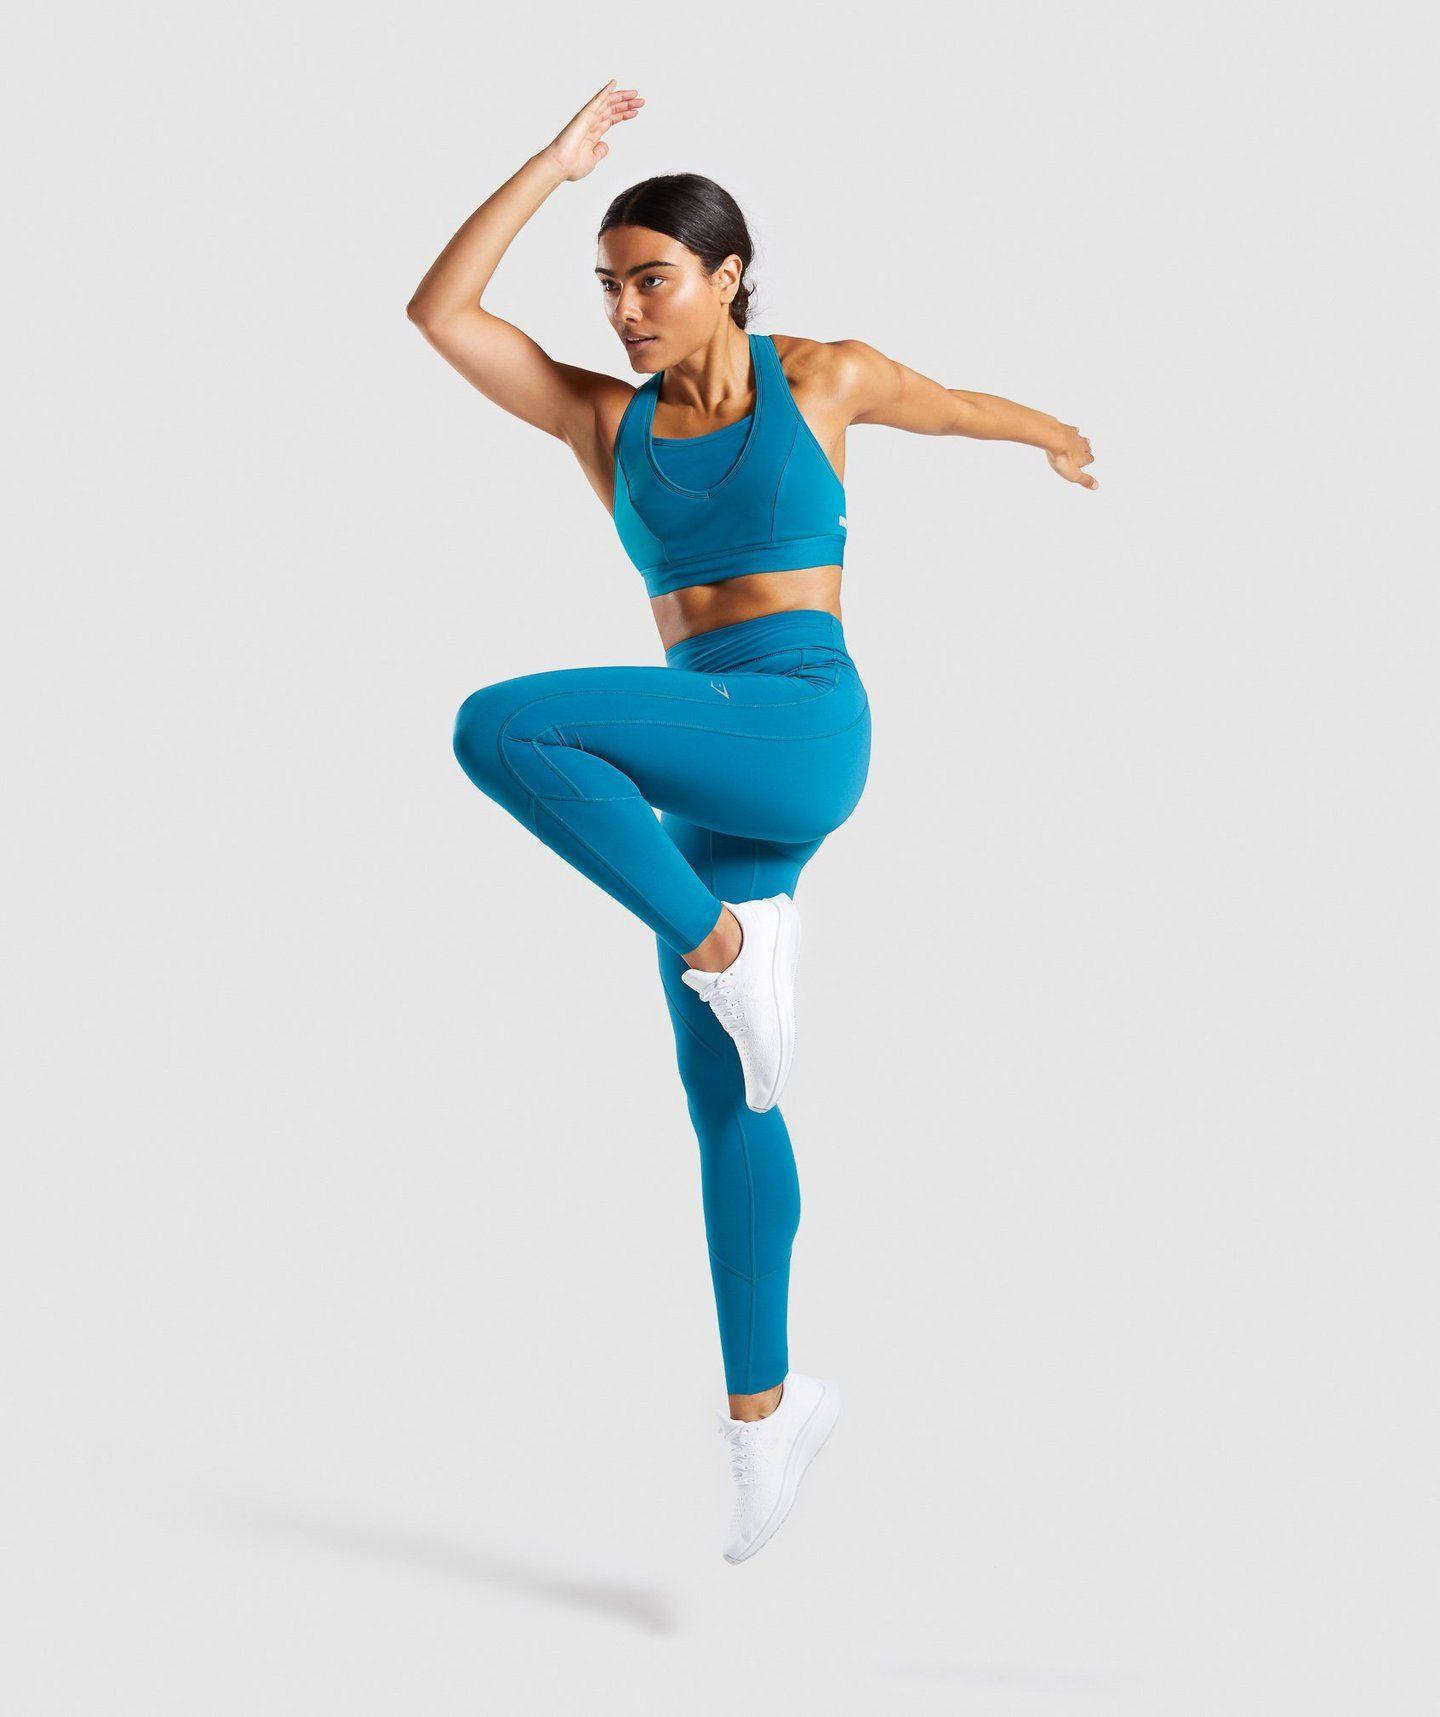 48b3ea154e9cb1 Gymshark Pace Running Leggings - Deep Teal in 2019 | Gym Threads ...